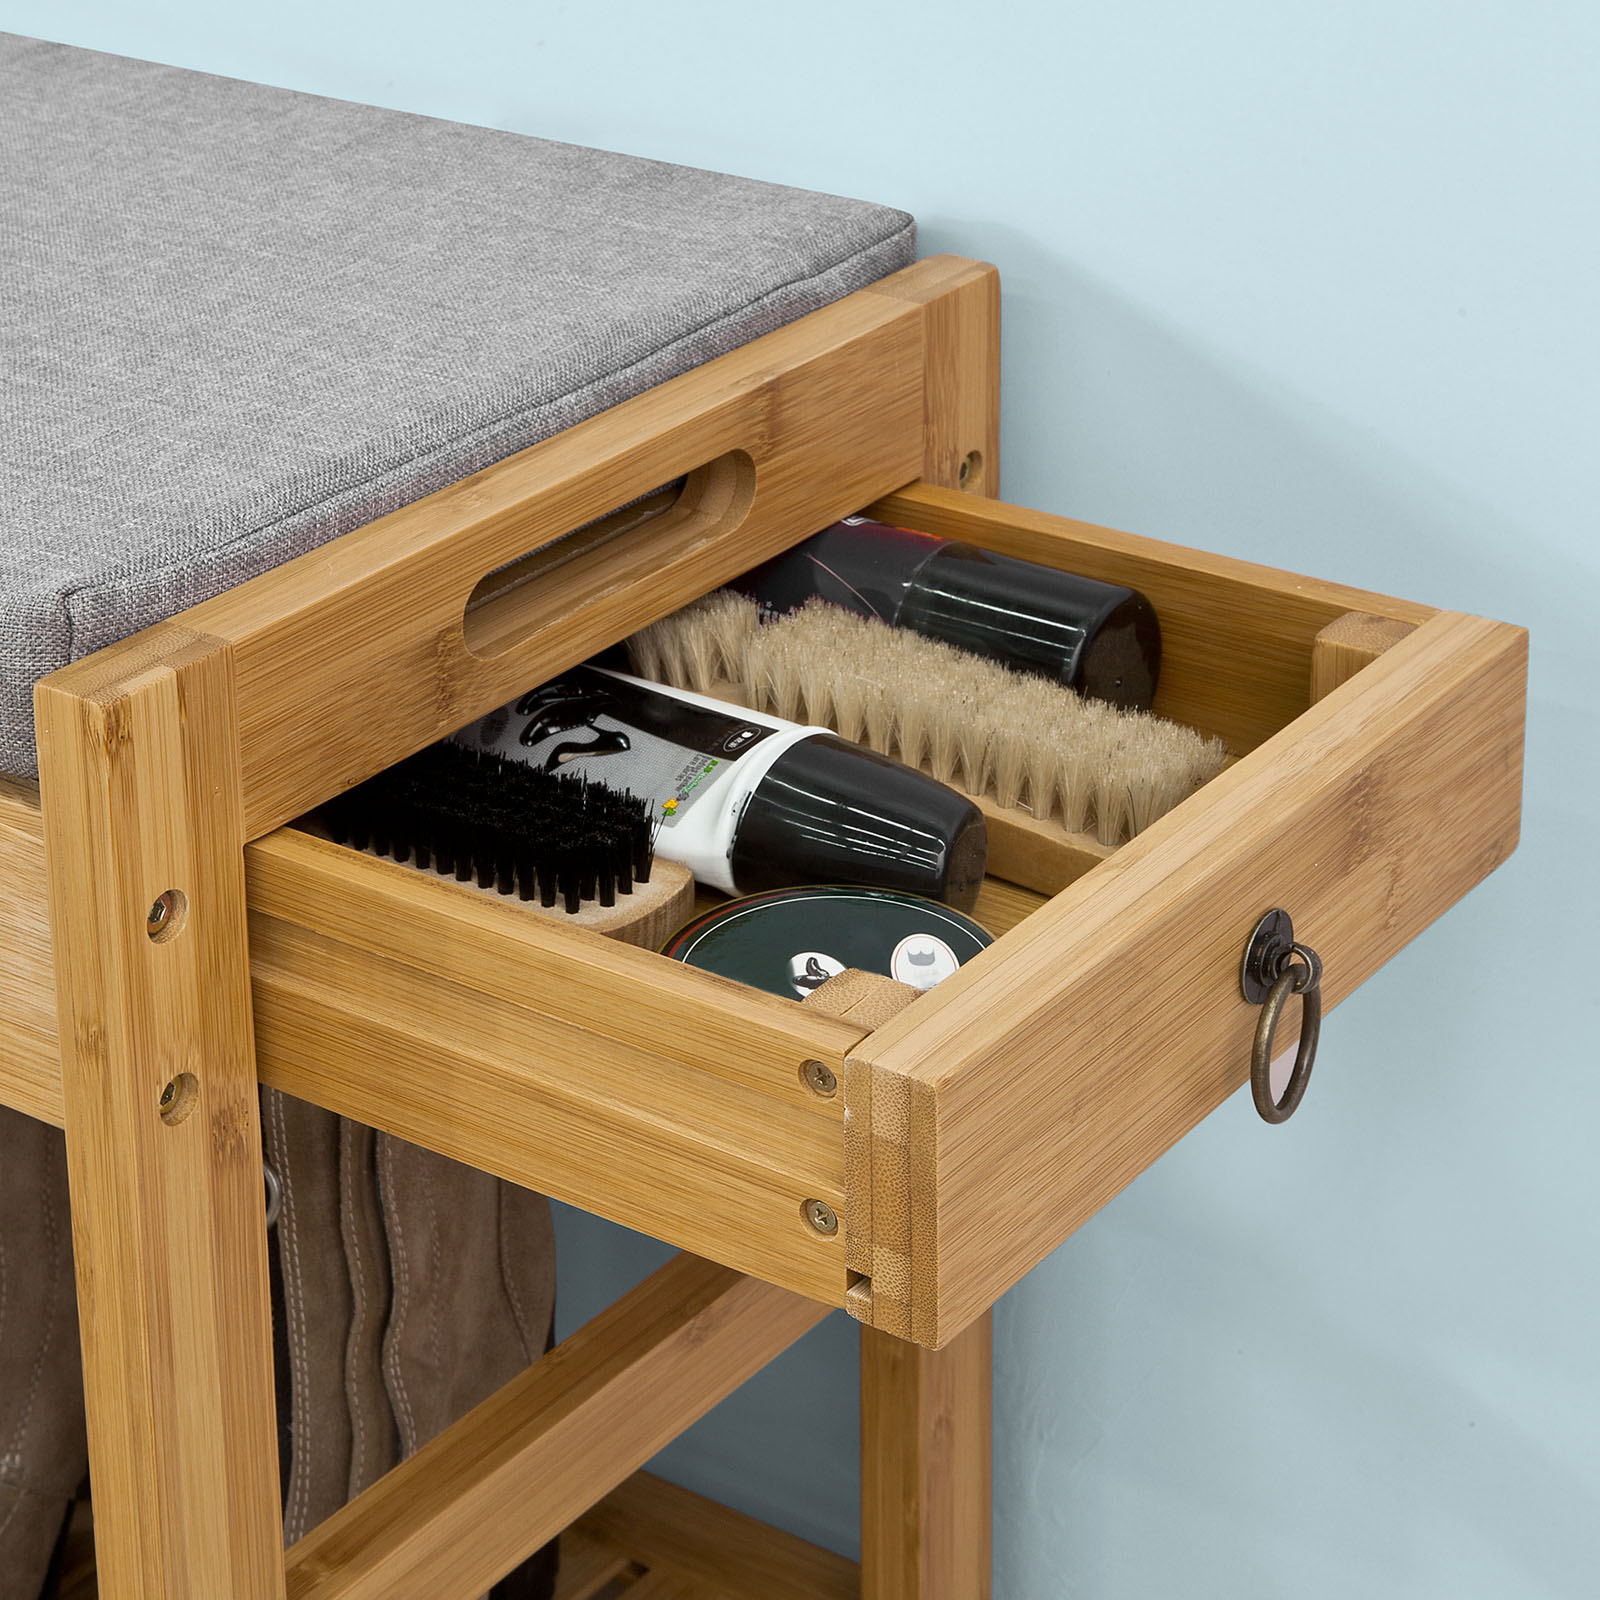 Sobuy 174 Padded Hallway Shoe Storage Rack Bench Seat With